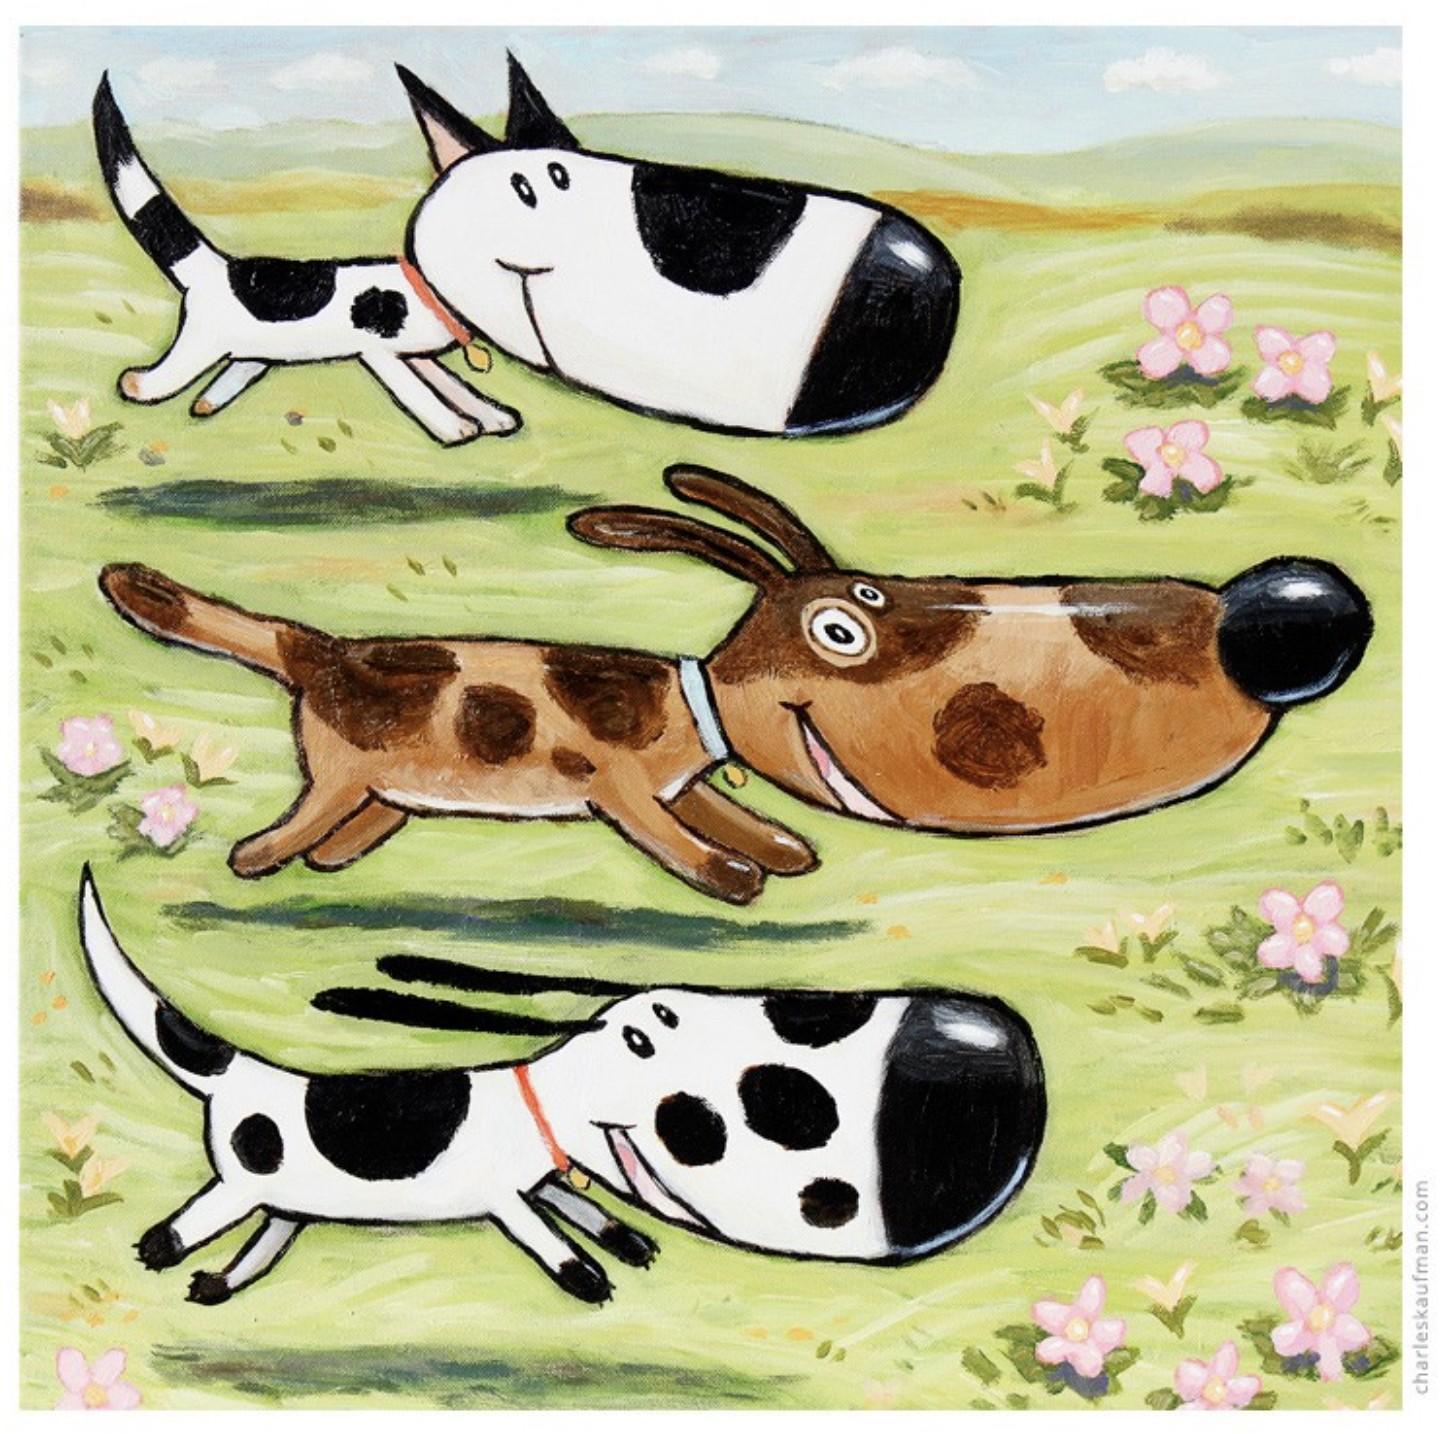 Three happy dogs - Kaufmann, Charles - k-CHK397